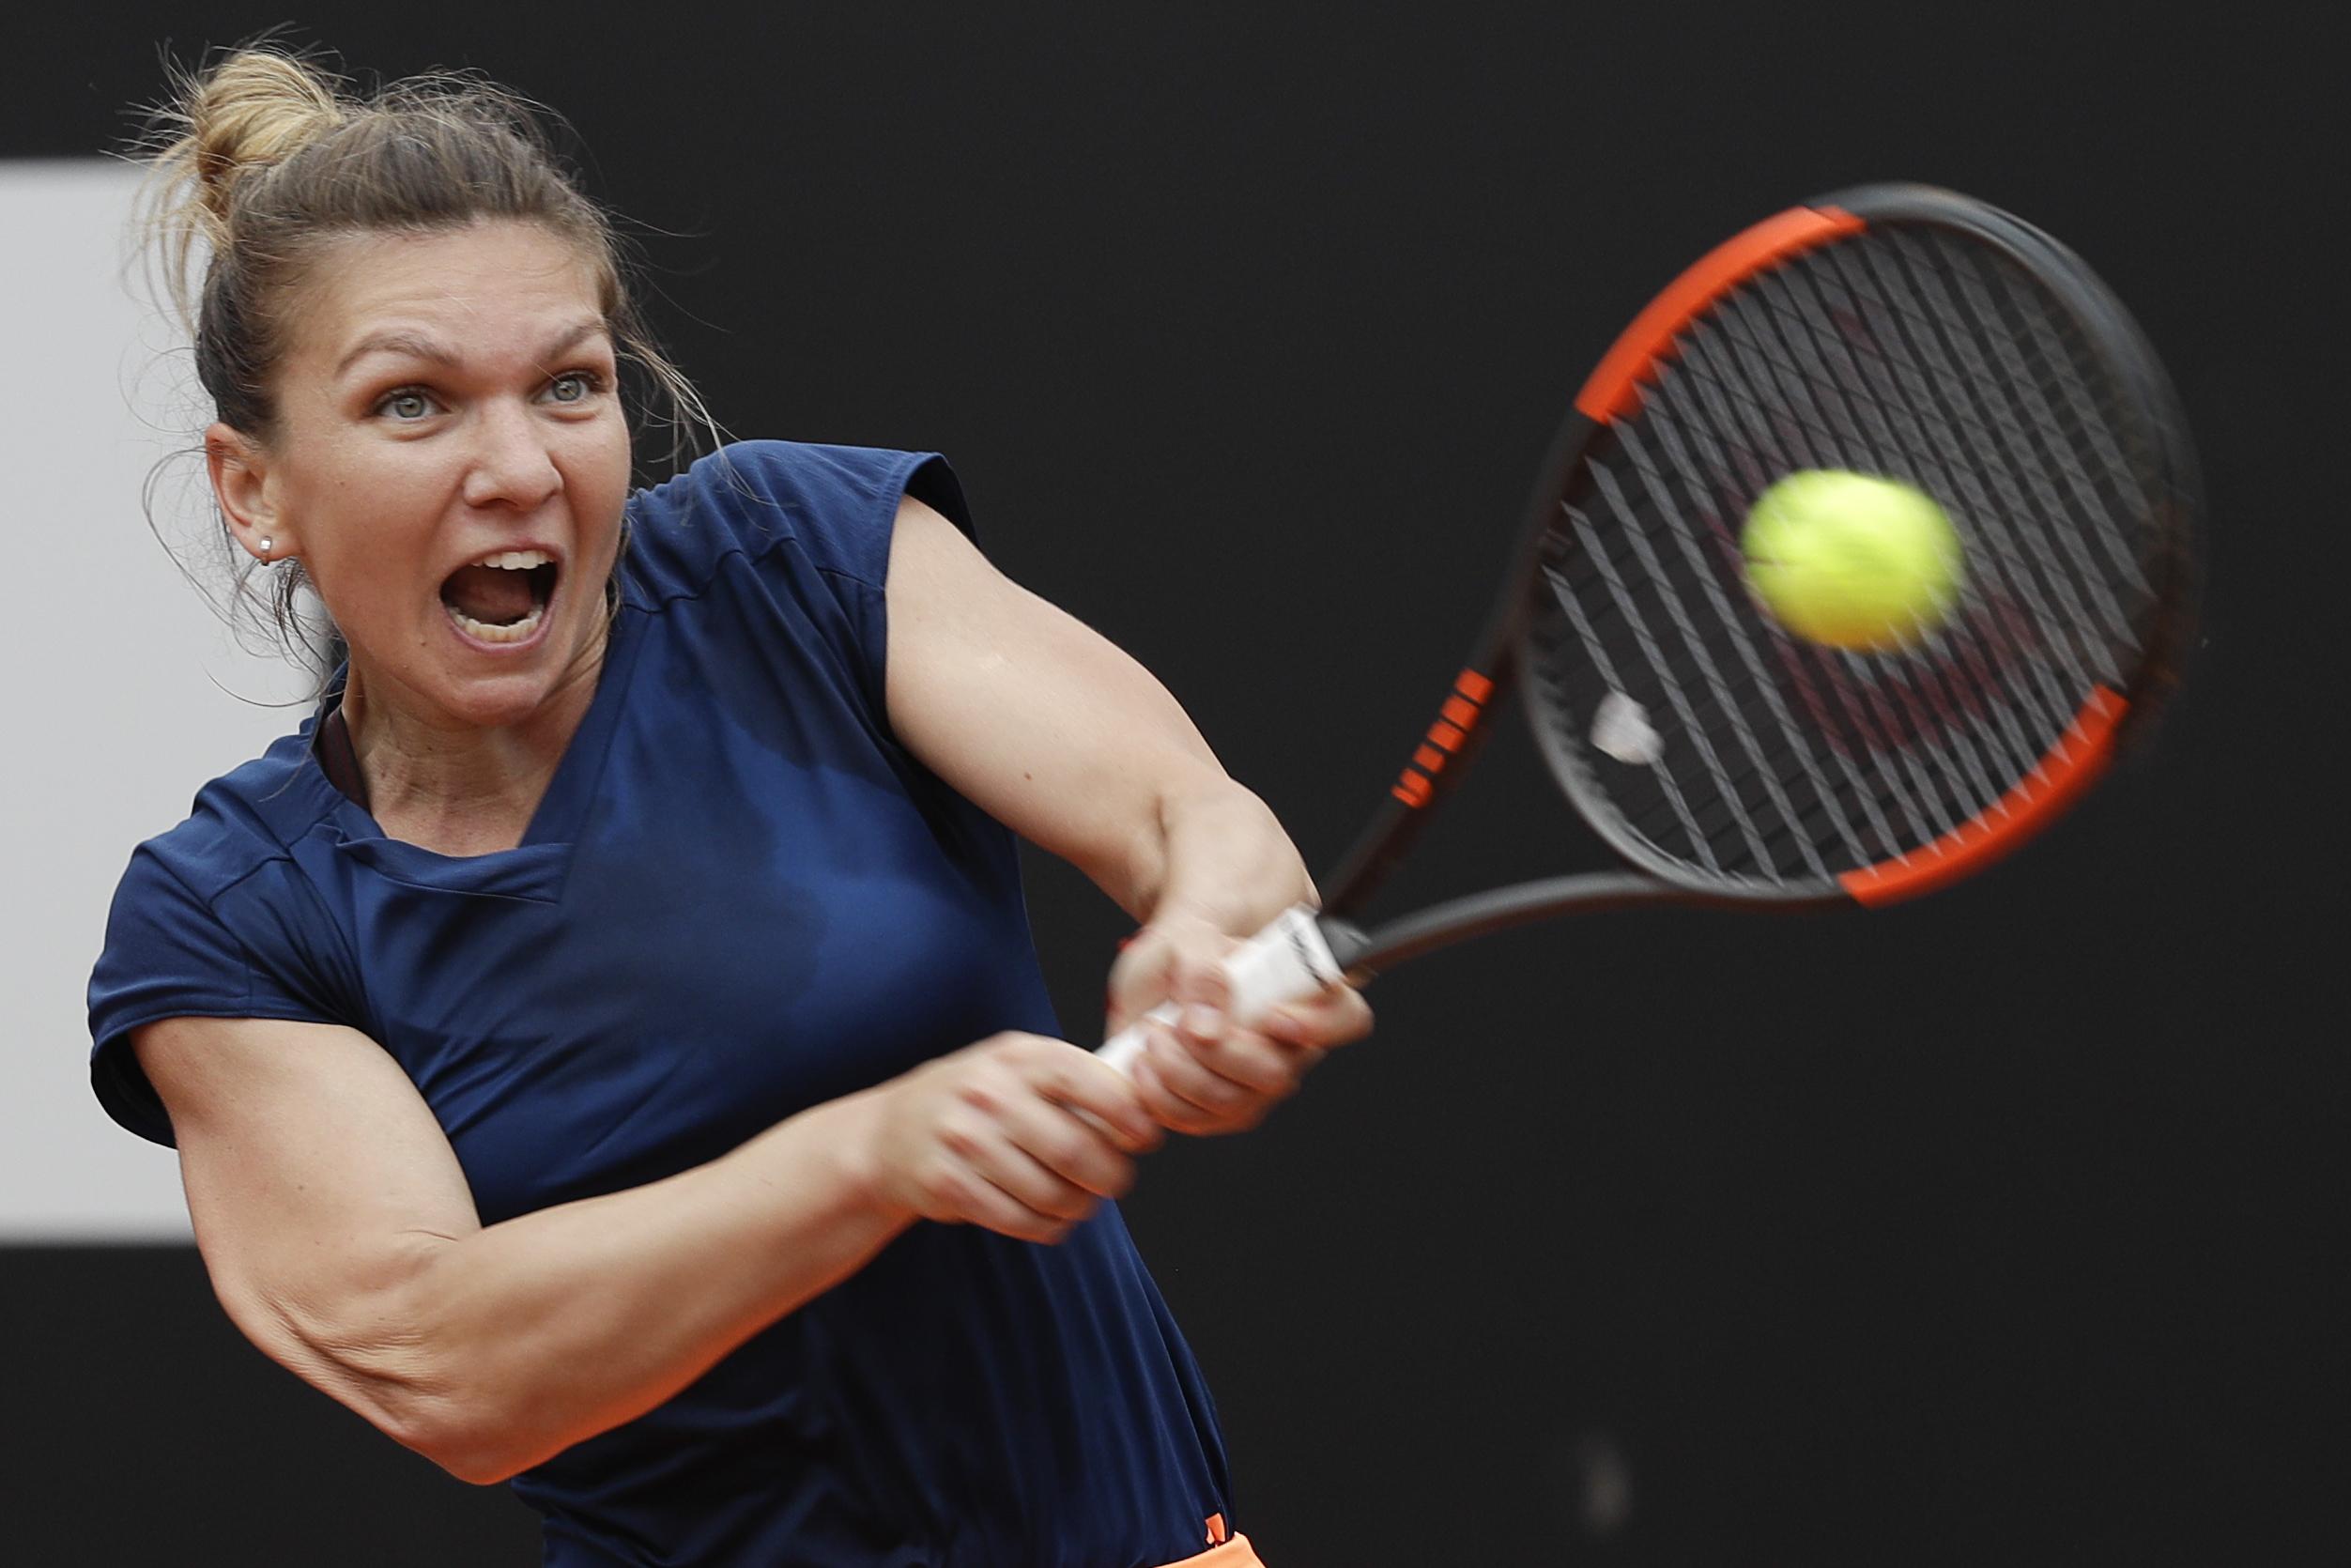 Romania's Simona Halep returns the ball during her semifinal match against Netherlands Kiki Bertens at the Italian Open tennis tournament, in Rome, Saturday, May 20, 2017. (AP Photo/Gregorio Borgia)